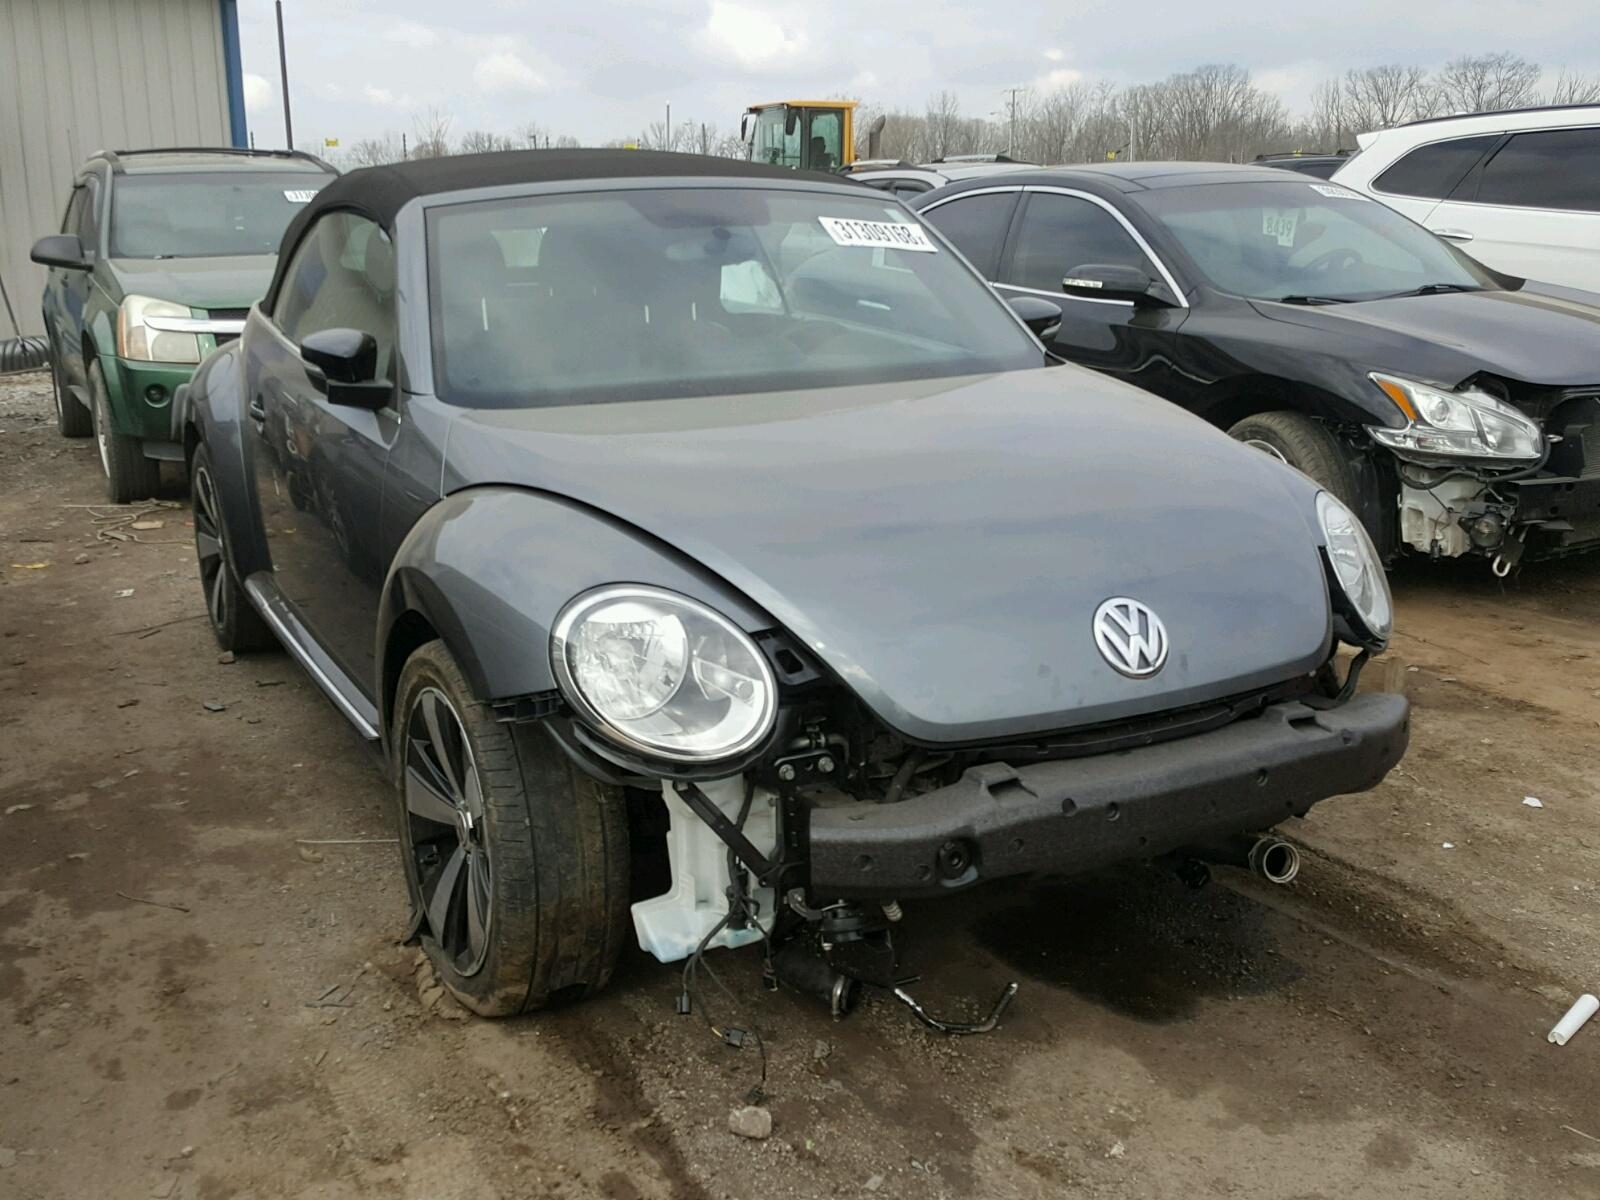 view left copart new beetle auctions of cert sale auto gray en online title lot in carfinder salvage ky louisville on volkswagen